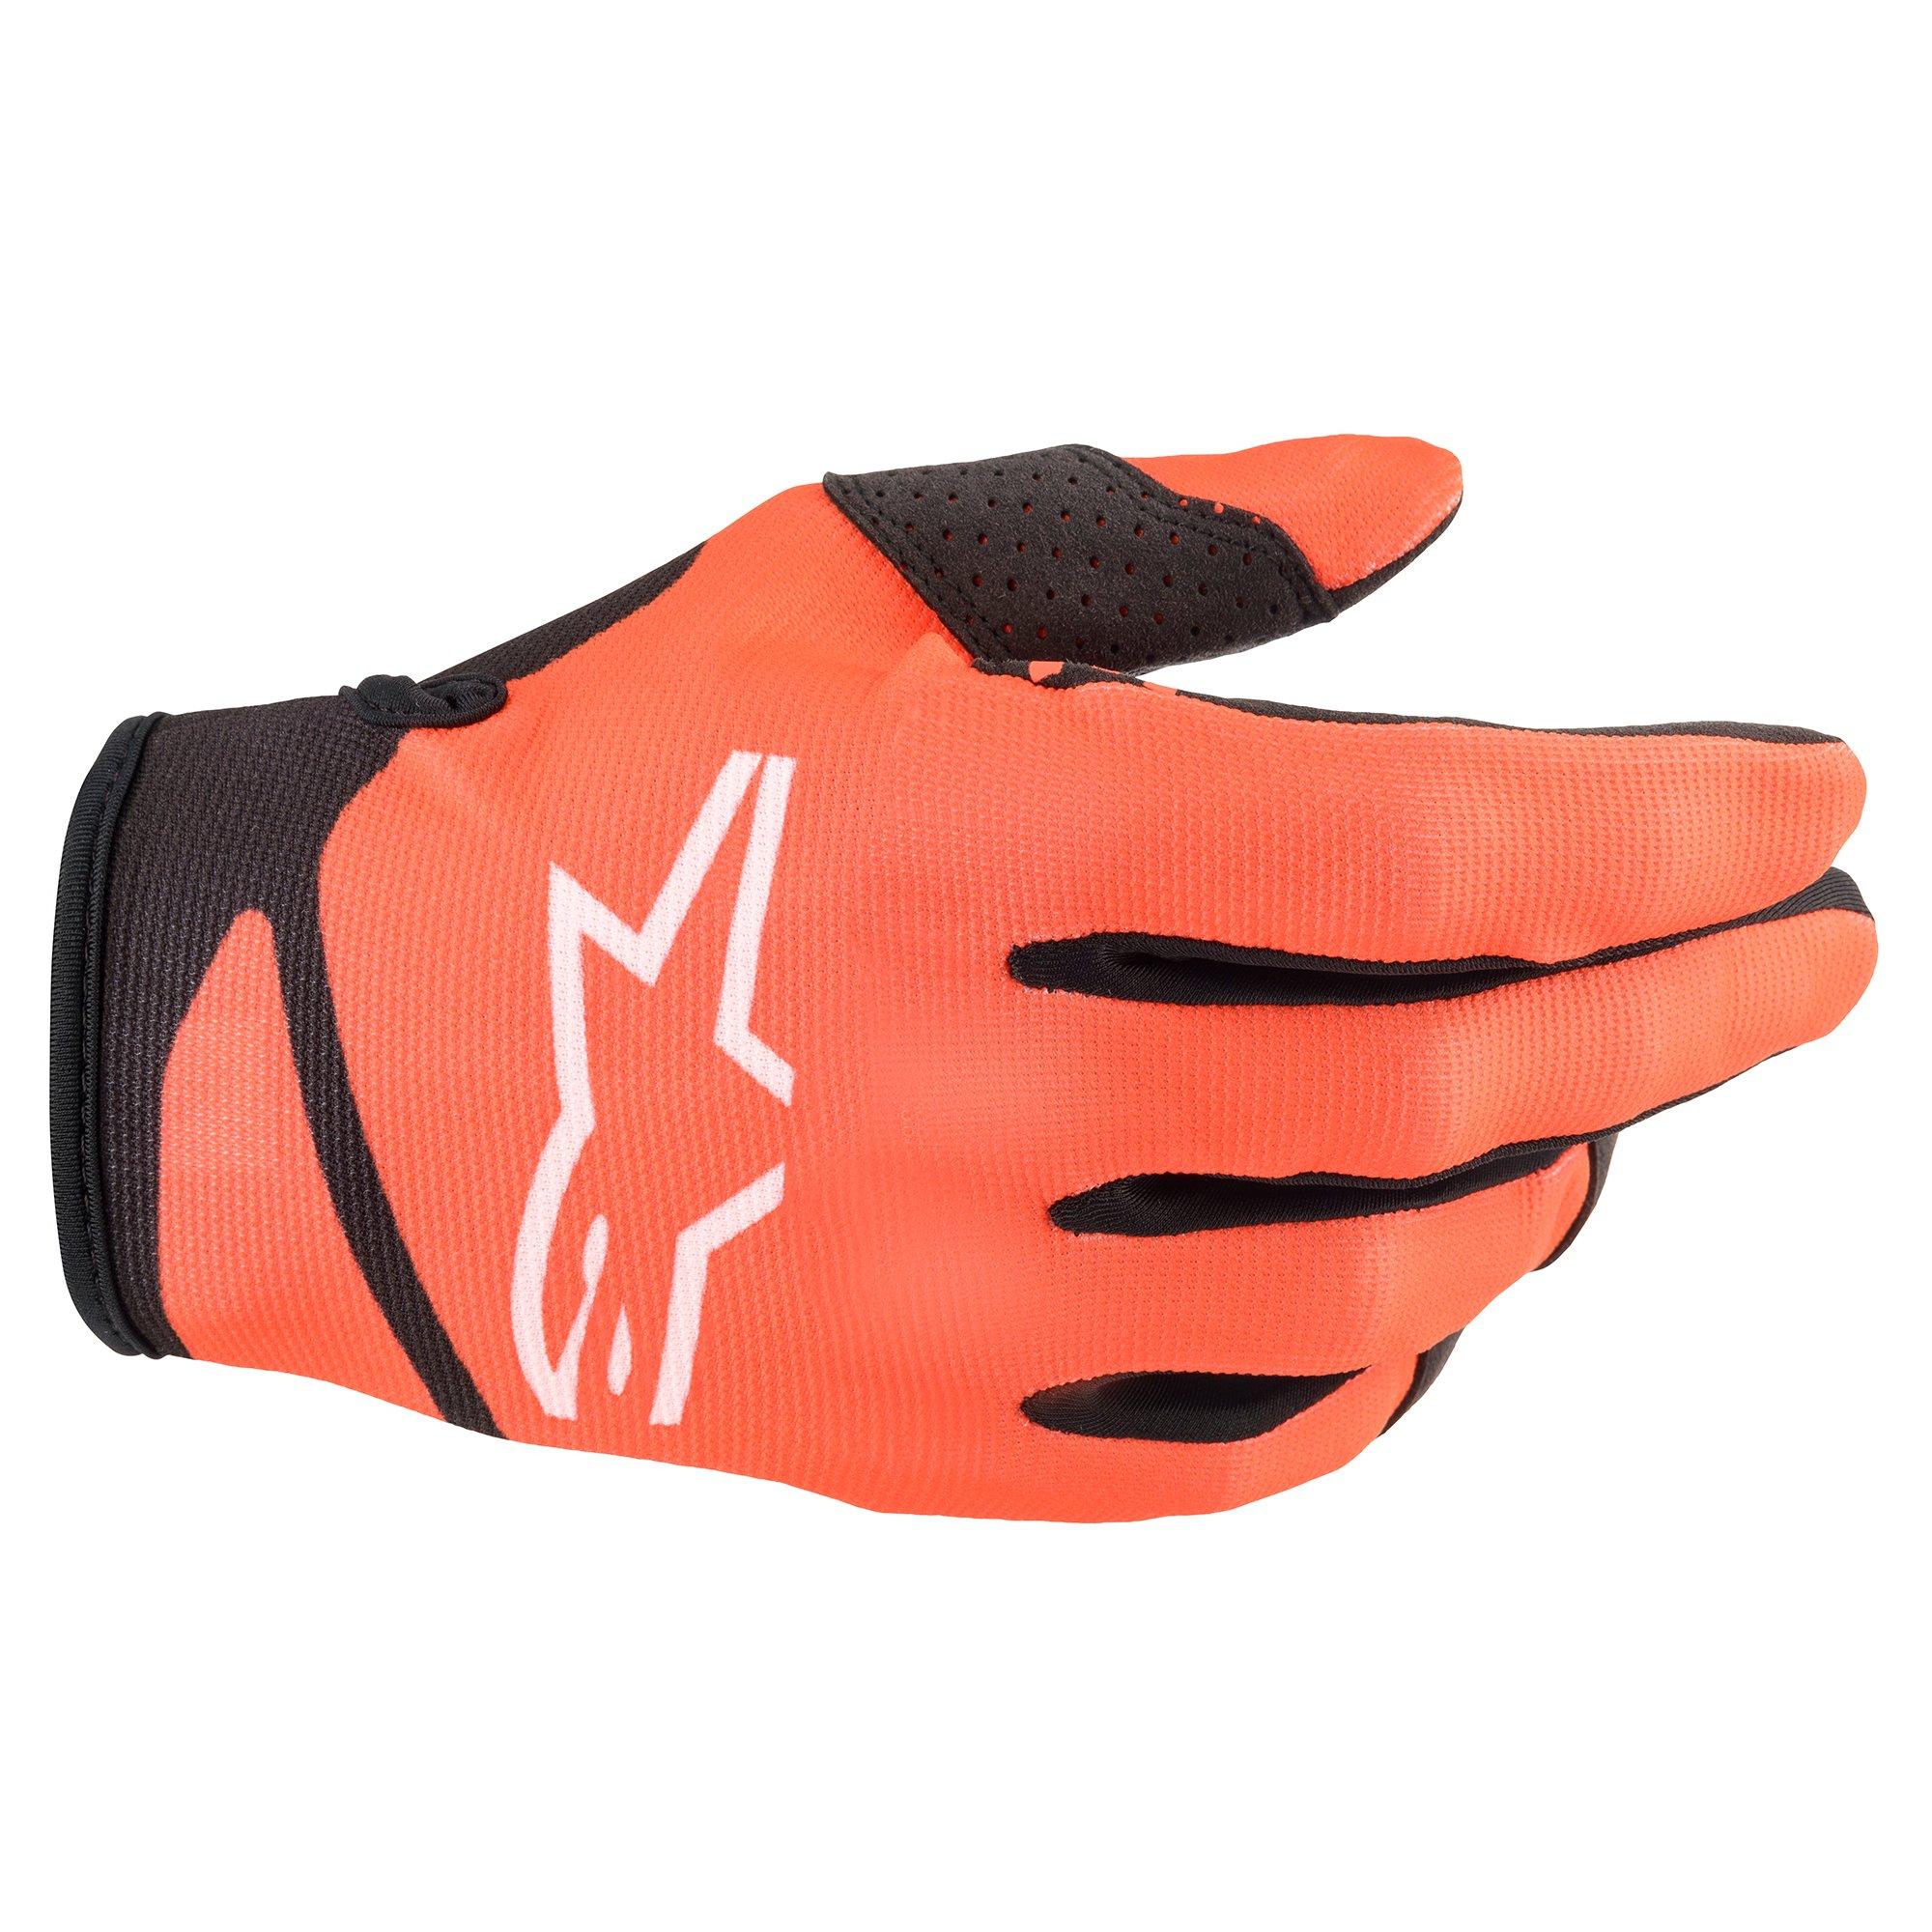 Alpinestars 2022 Youth Radar Orange/Black Gloves